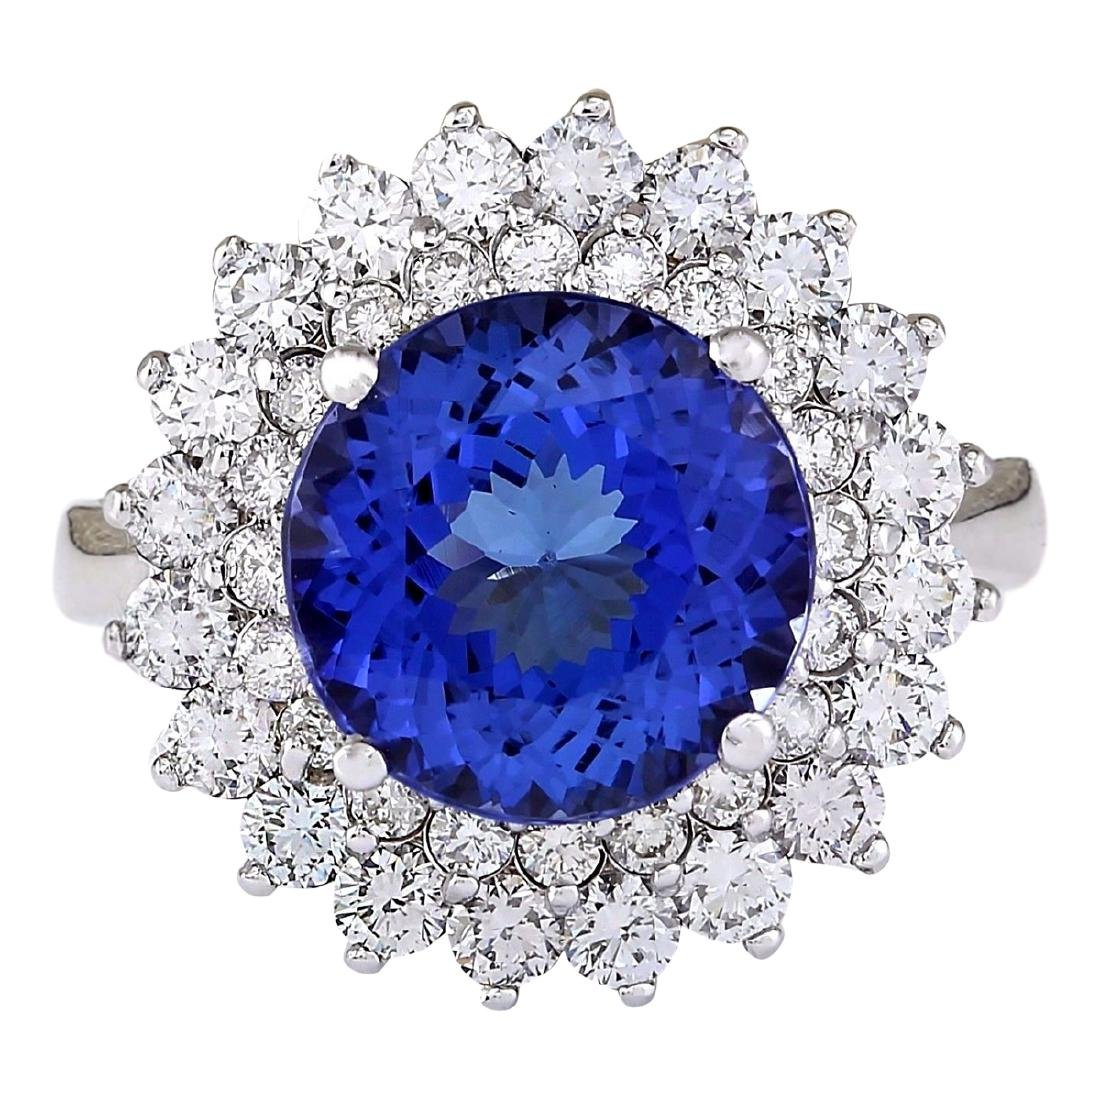 5.68 CTW Natural Blue Tanzanite And Diamond Ring 18K